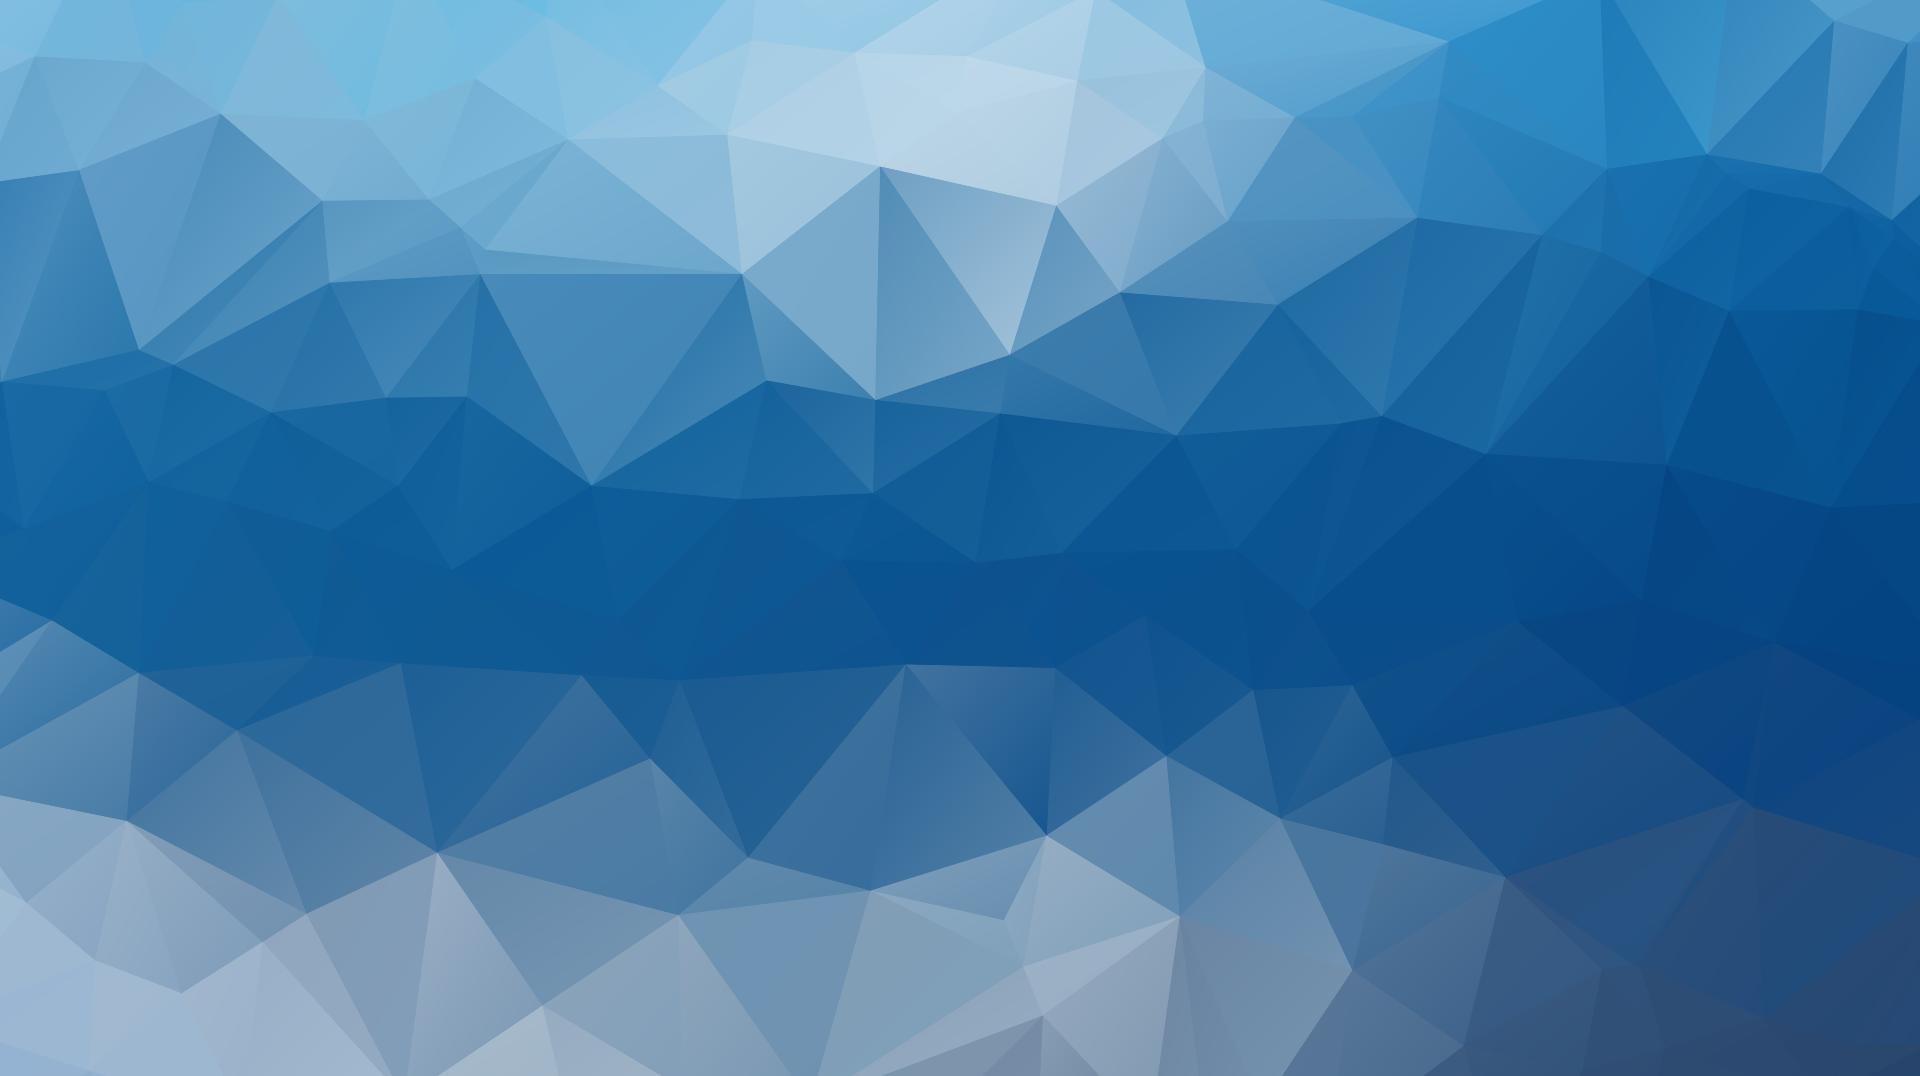 maglia, triangoli, poligoni, Blu, Celeste - Sfondi HD - Professor-falken.com